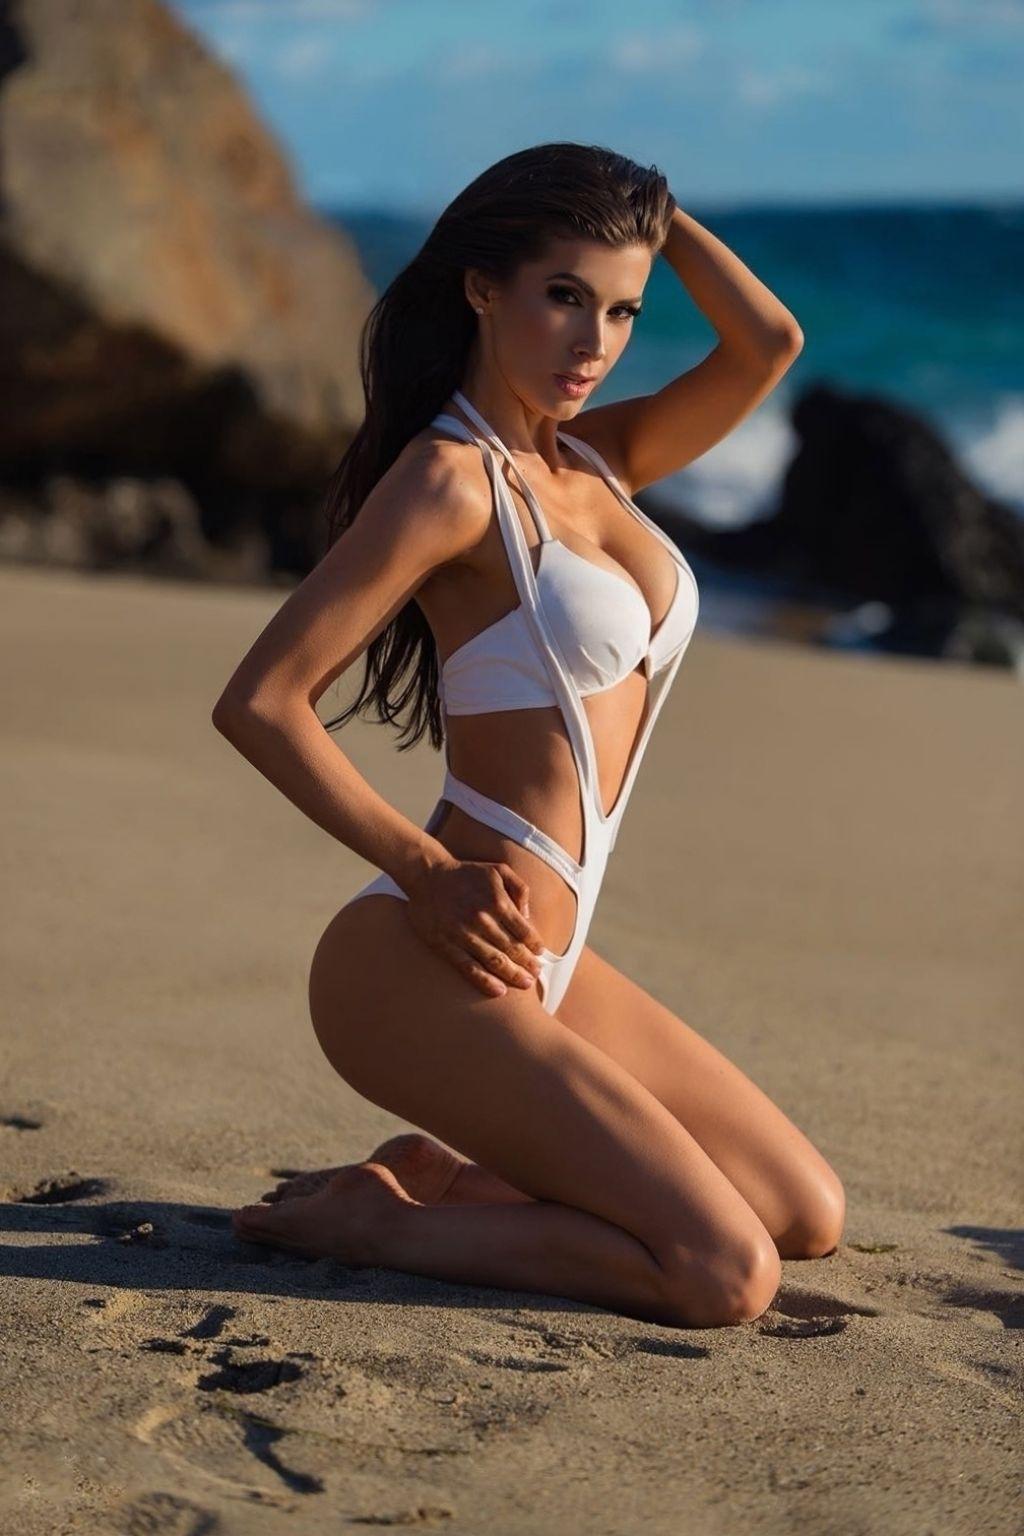 Bikini Ildiko Ferenczi nudes (25 foto and video), Sexy, Is a cute, Twitter, braless 2019